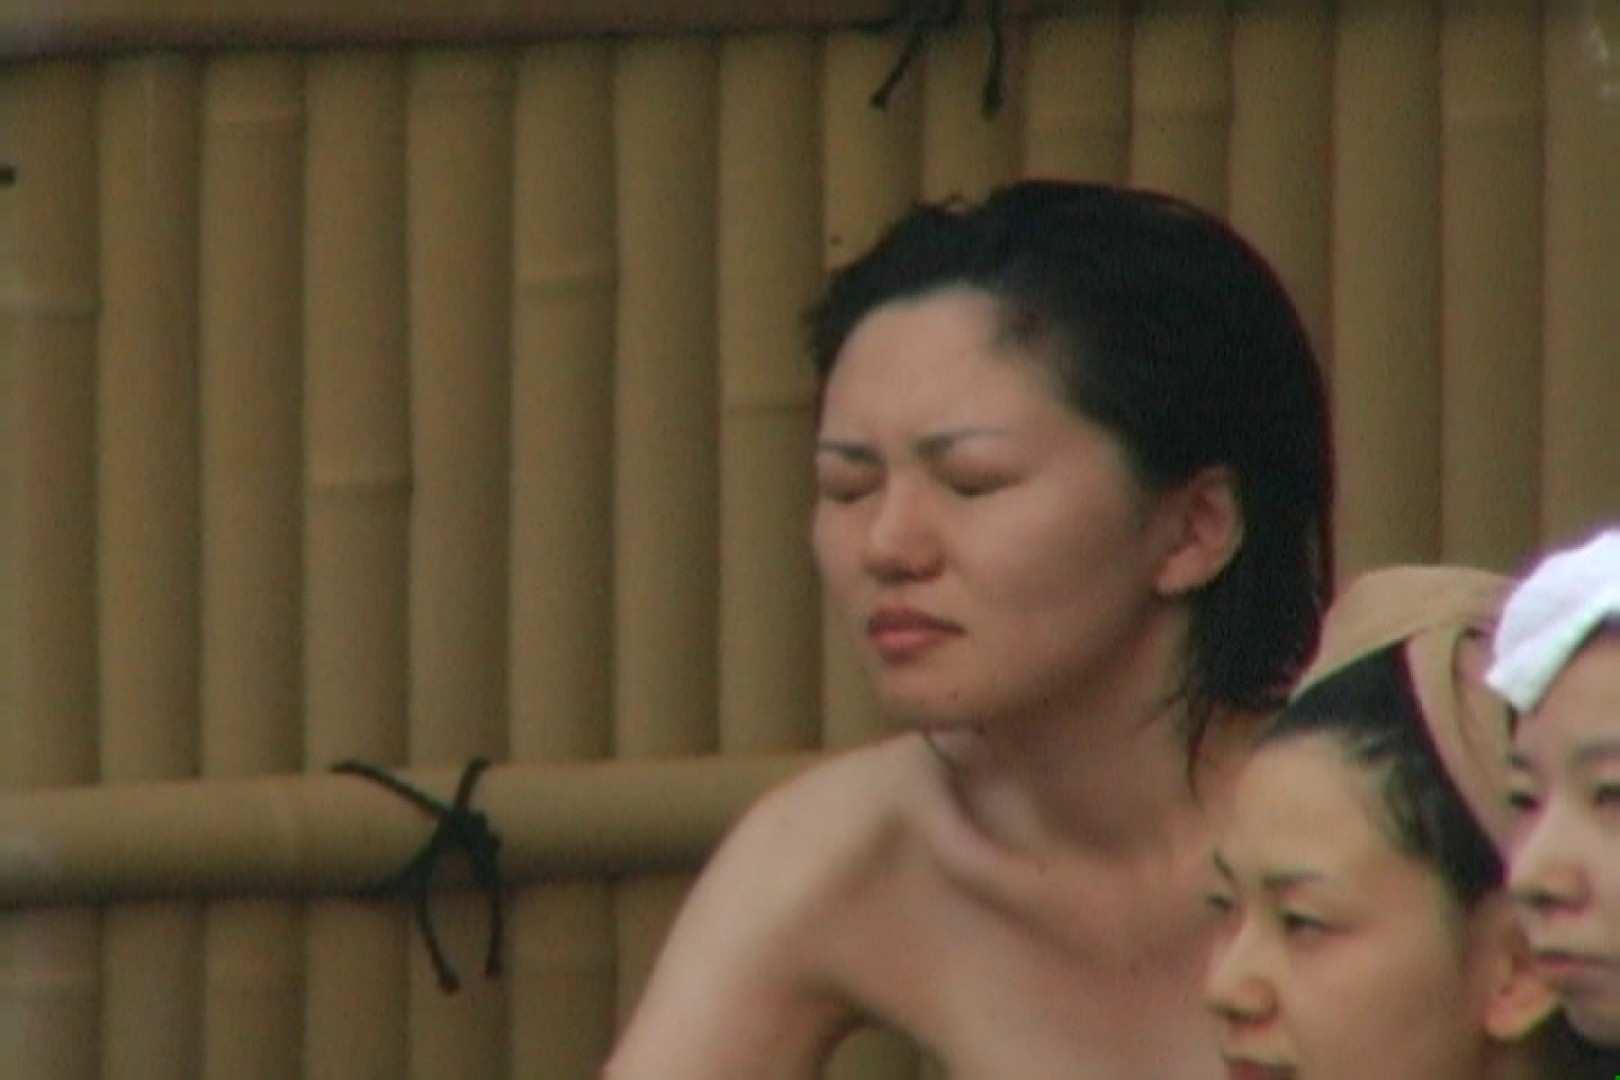 Aquaな露天風呂Vol.613 盗撮シリーズ | 露天風呂編  109PIX 77